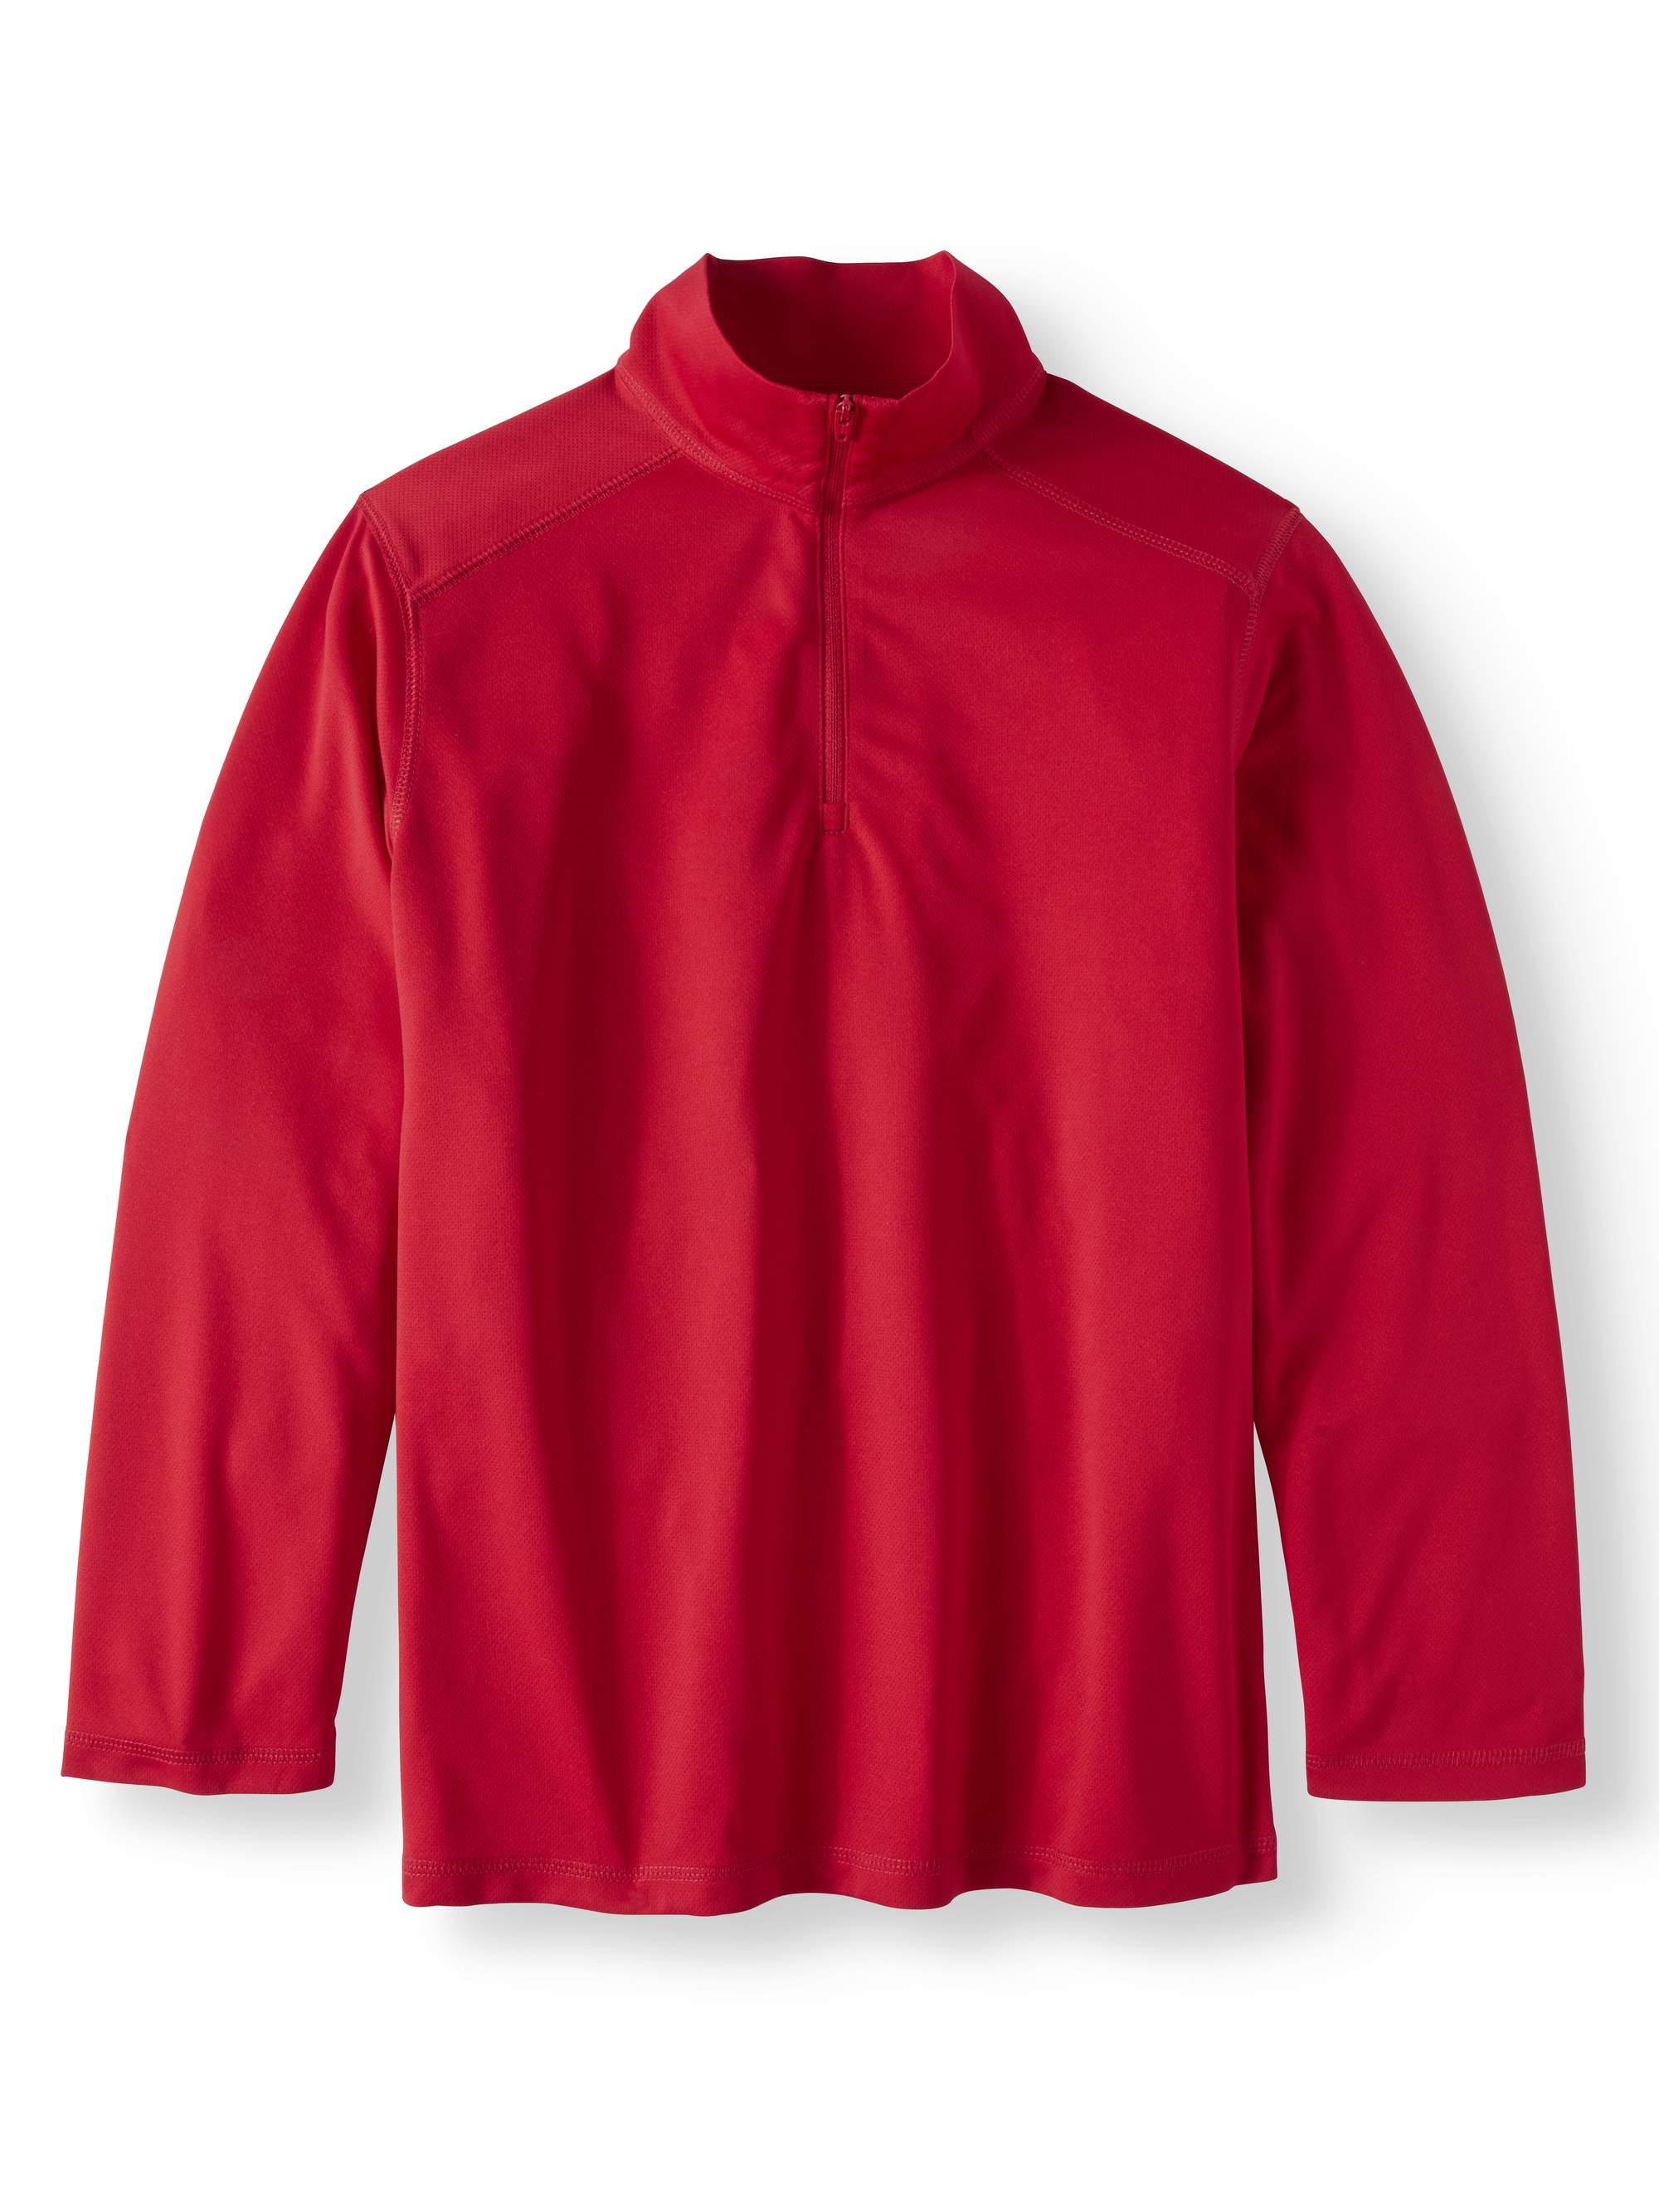 Boys School Uniform Quarter Zip Performance Pullover